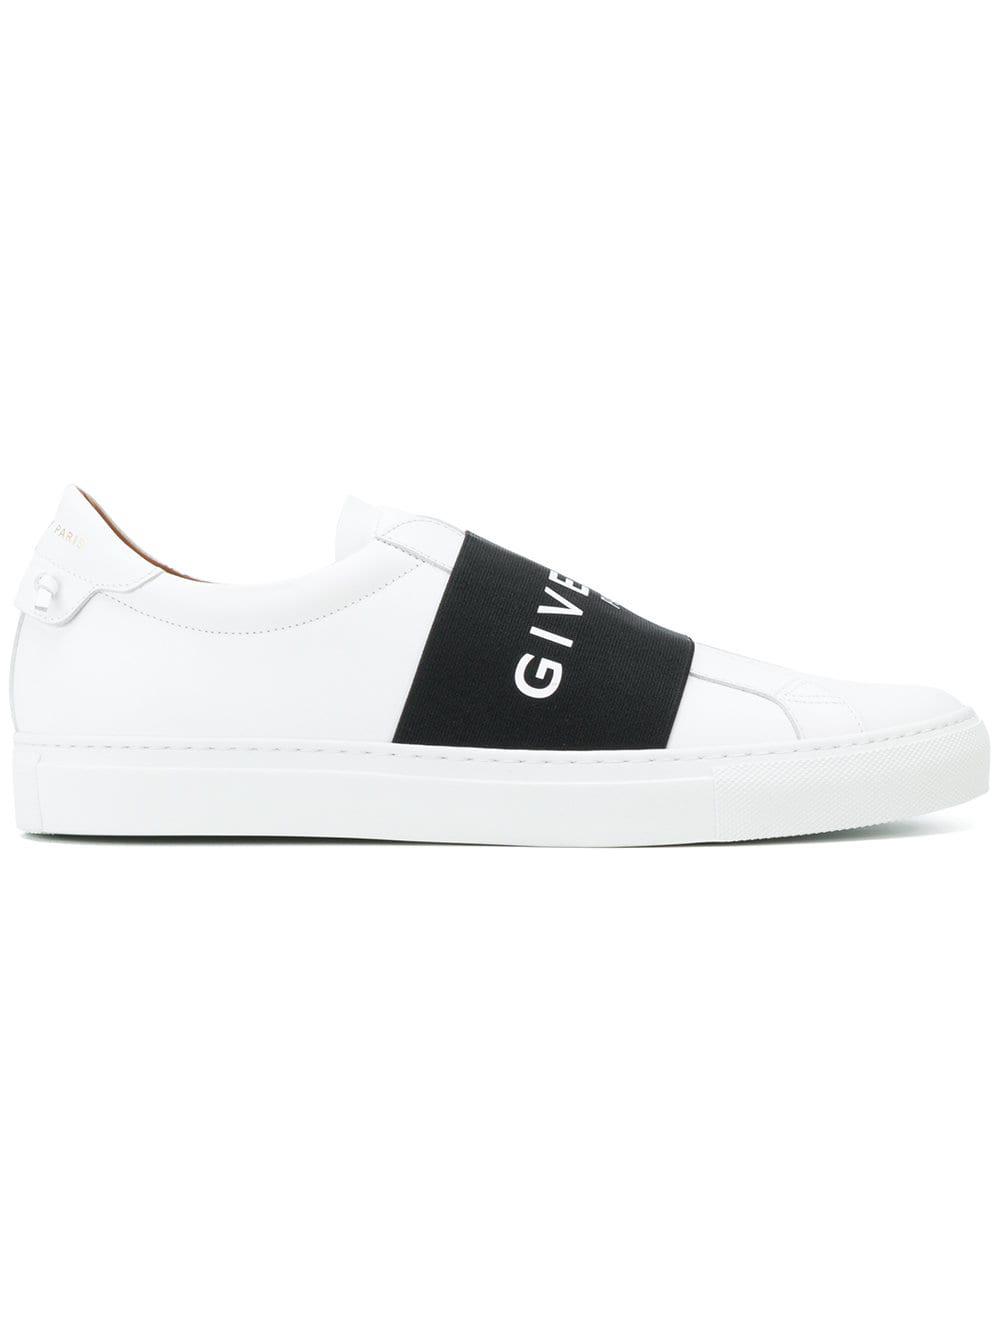 sneakers-givenchy-lesthete-lille.jpg